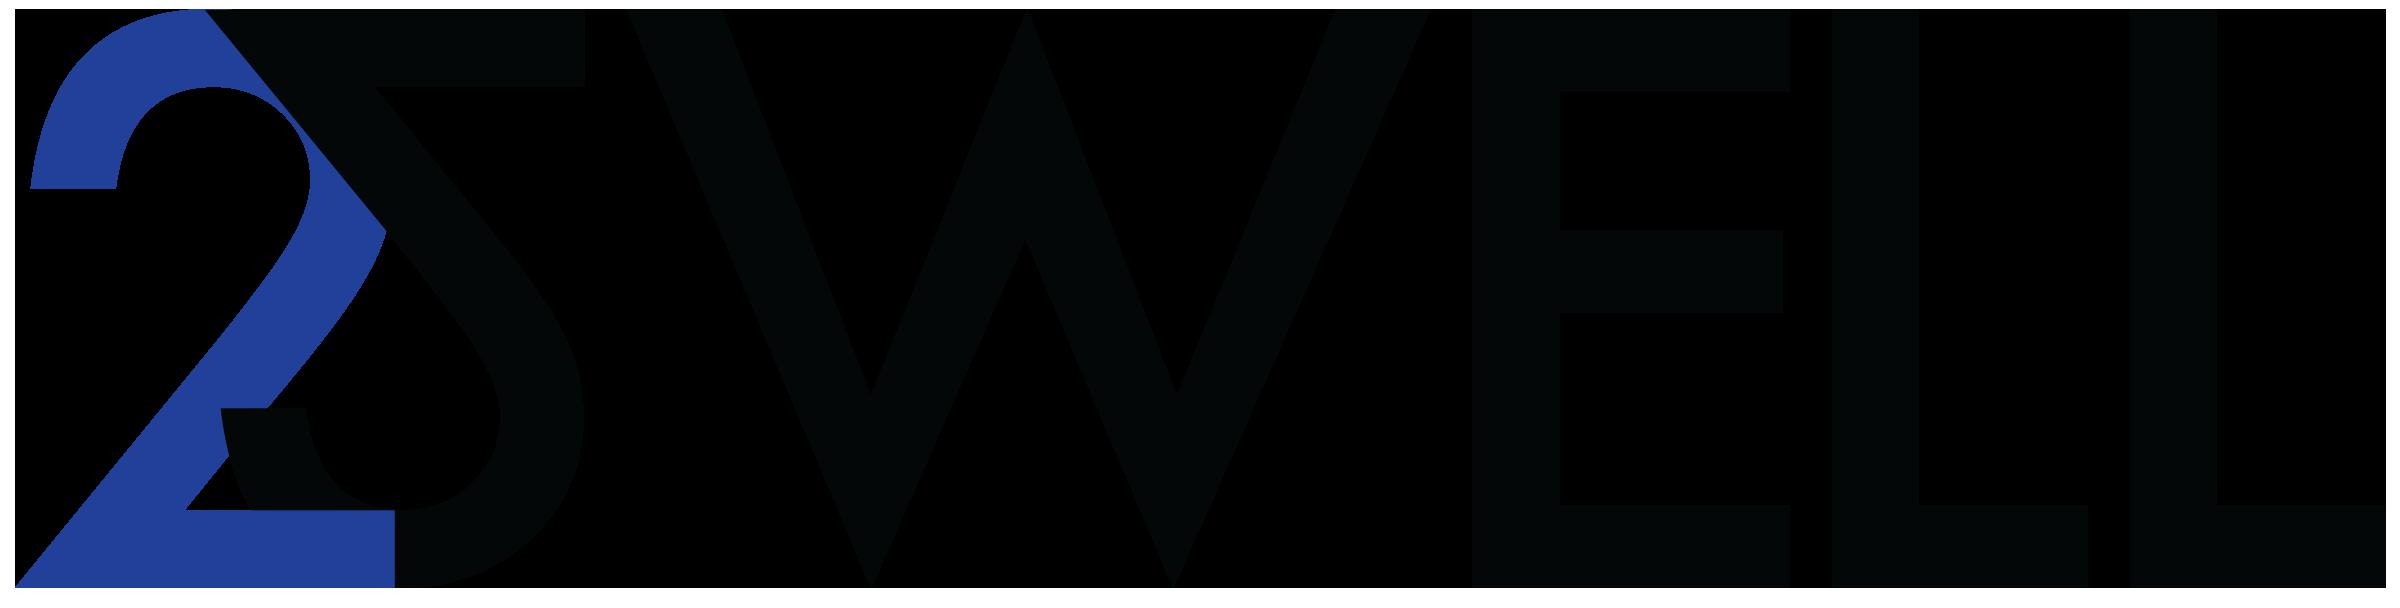 2S-logo-5.png